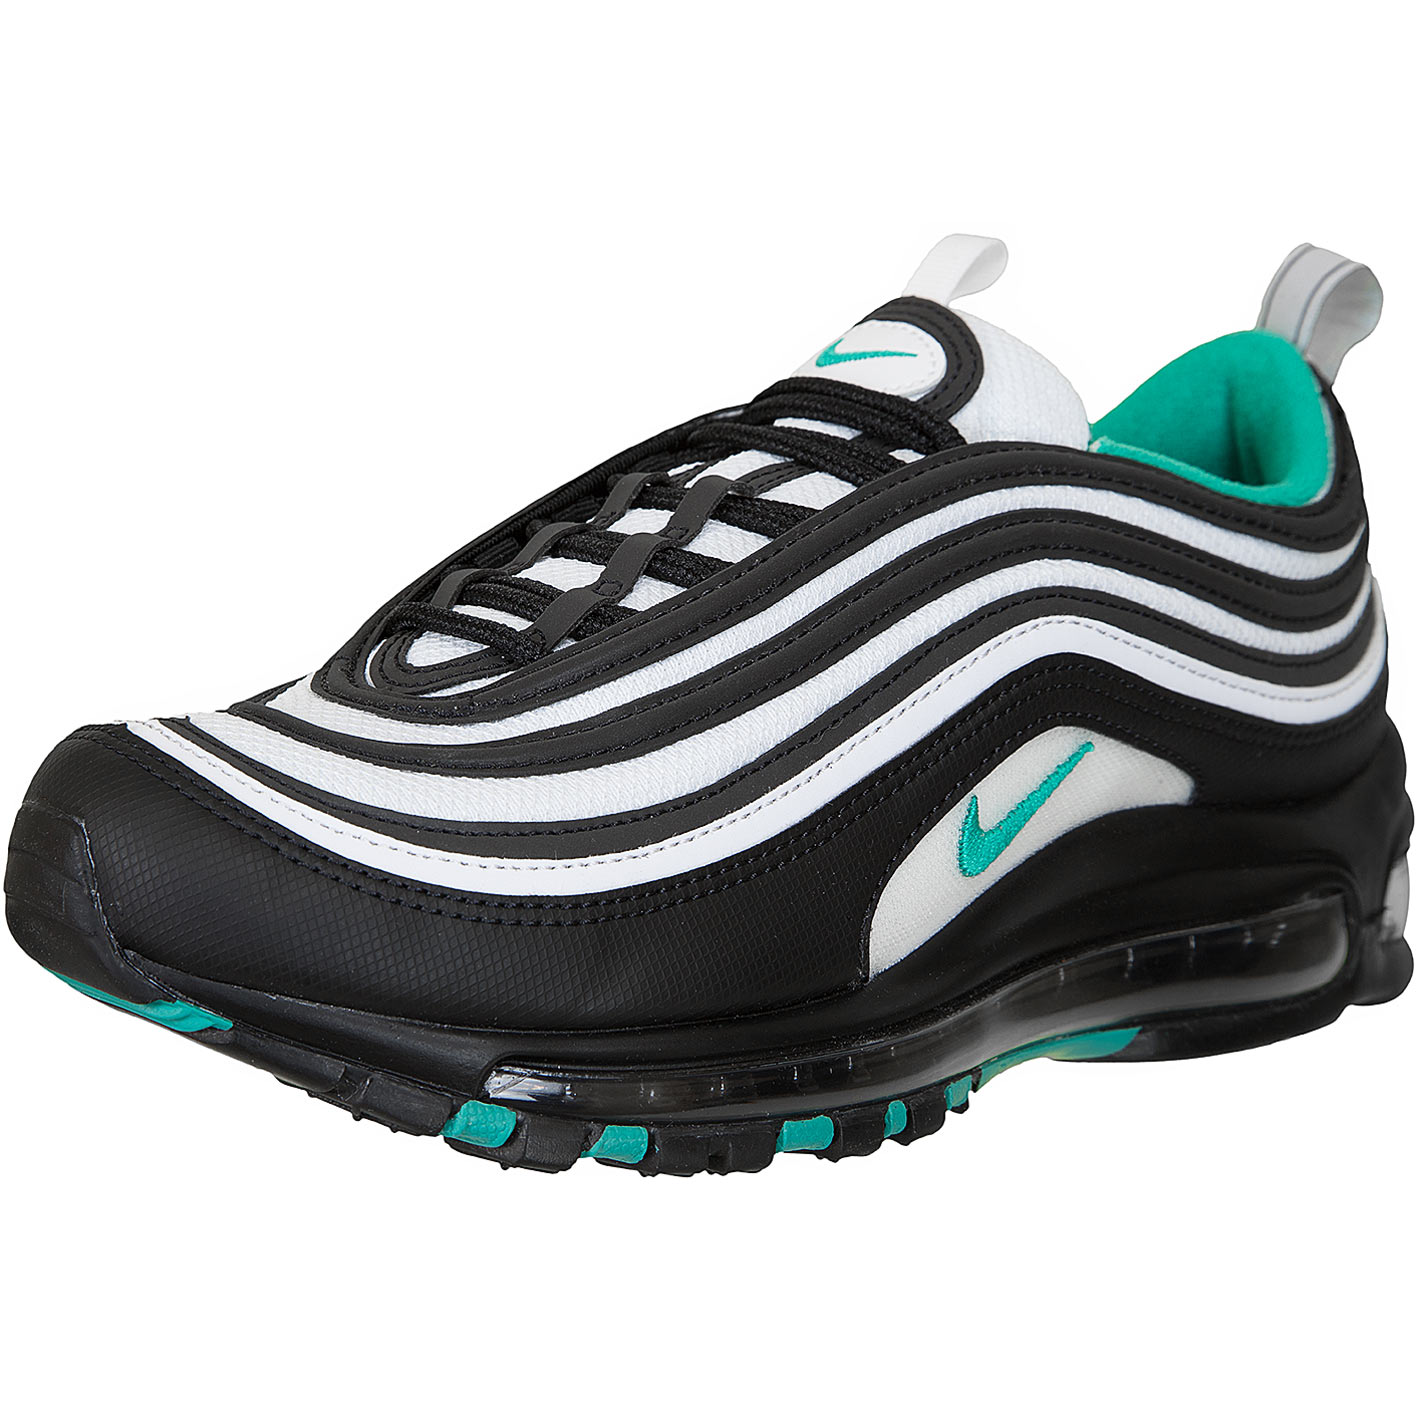 fef76c667e1ba4 ☆ Nike Sneaker Air Max 97 schwarz emerald - hier bestellen!